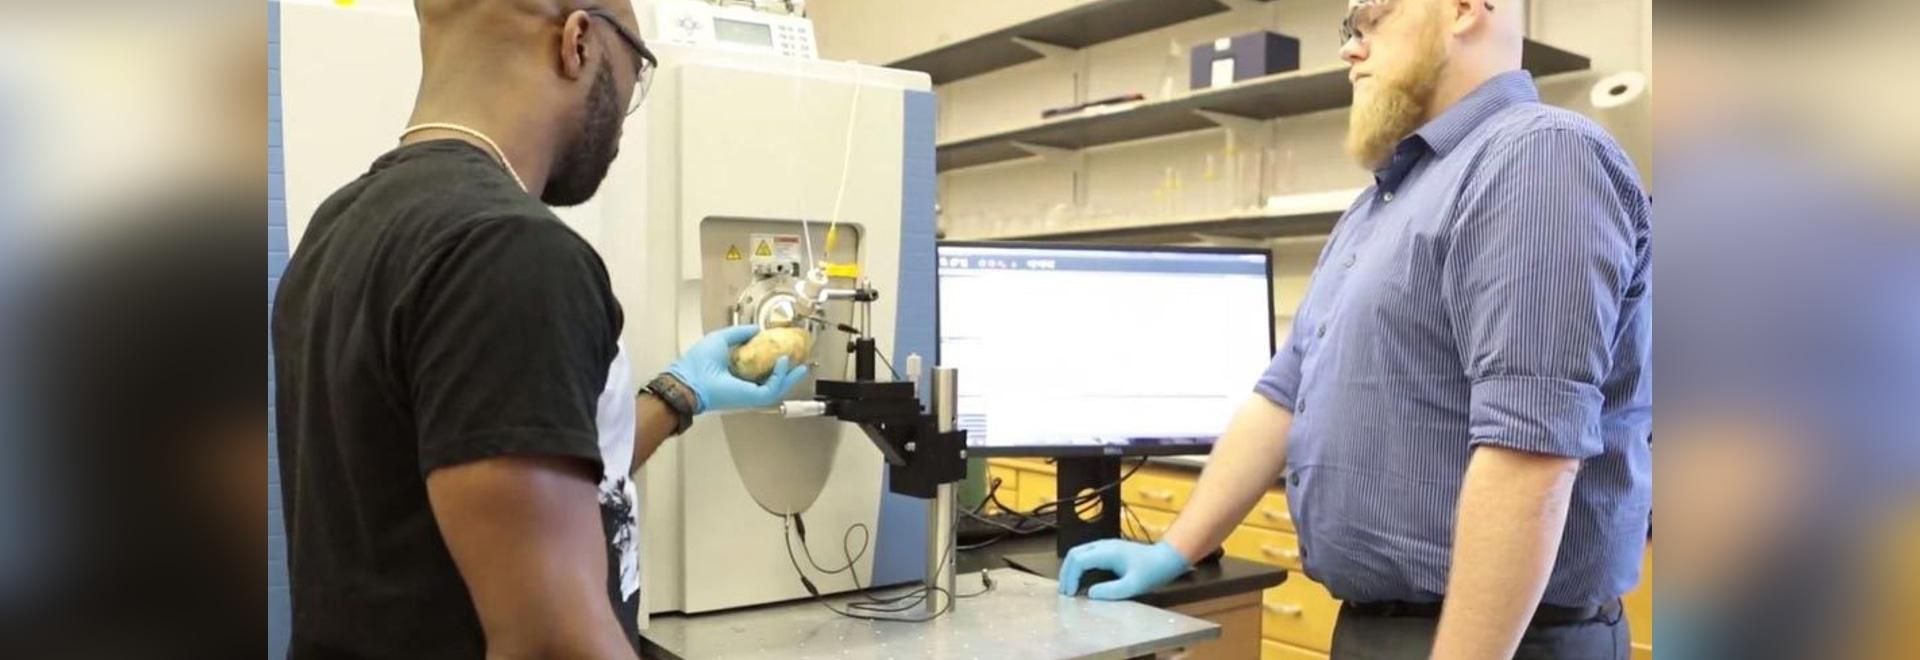 Mass Spectrometry Detection for the Masses